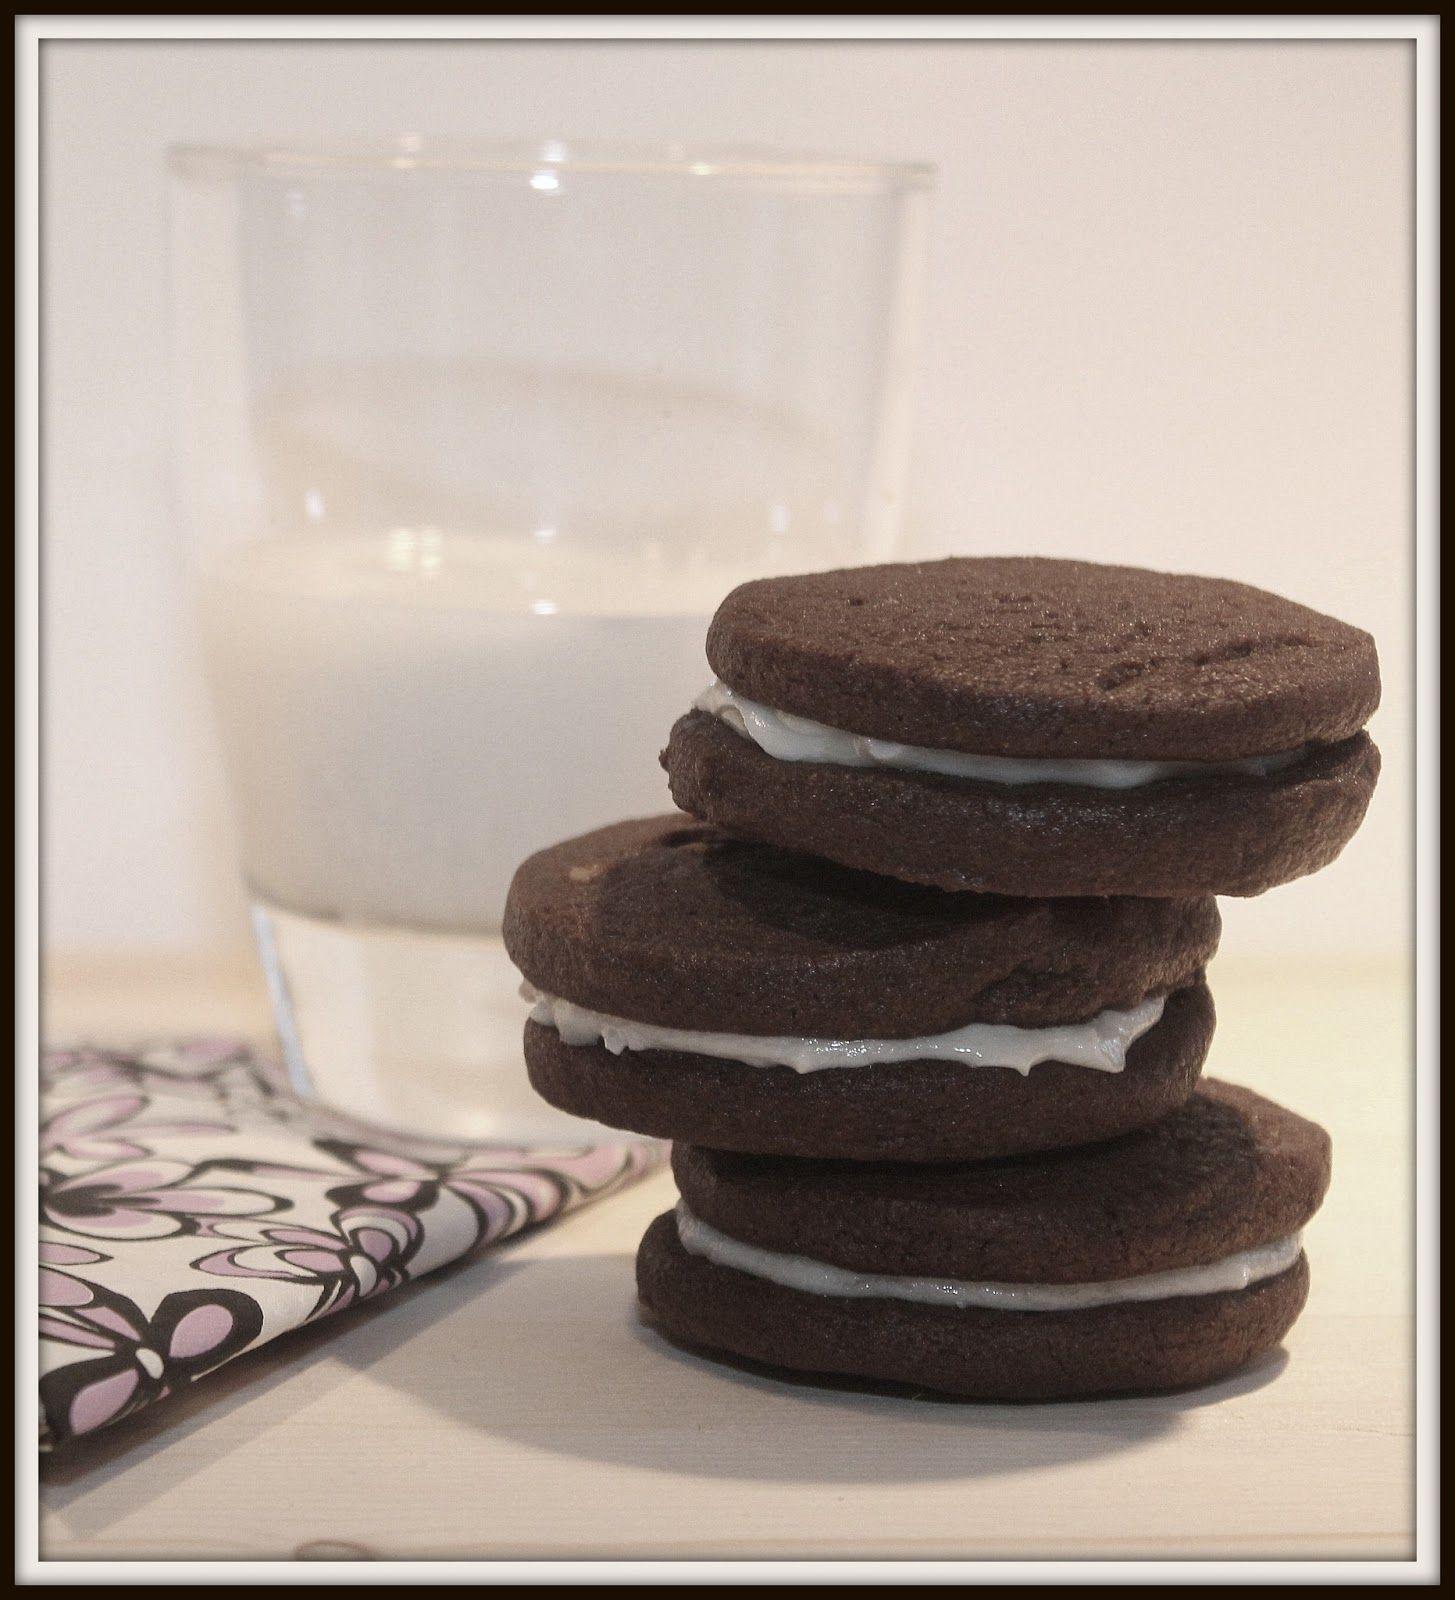 Cinq Fourchettes etc.: Biscuits Oreo maison